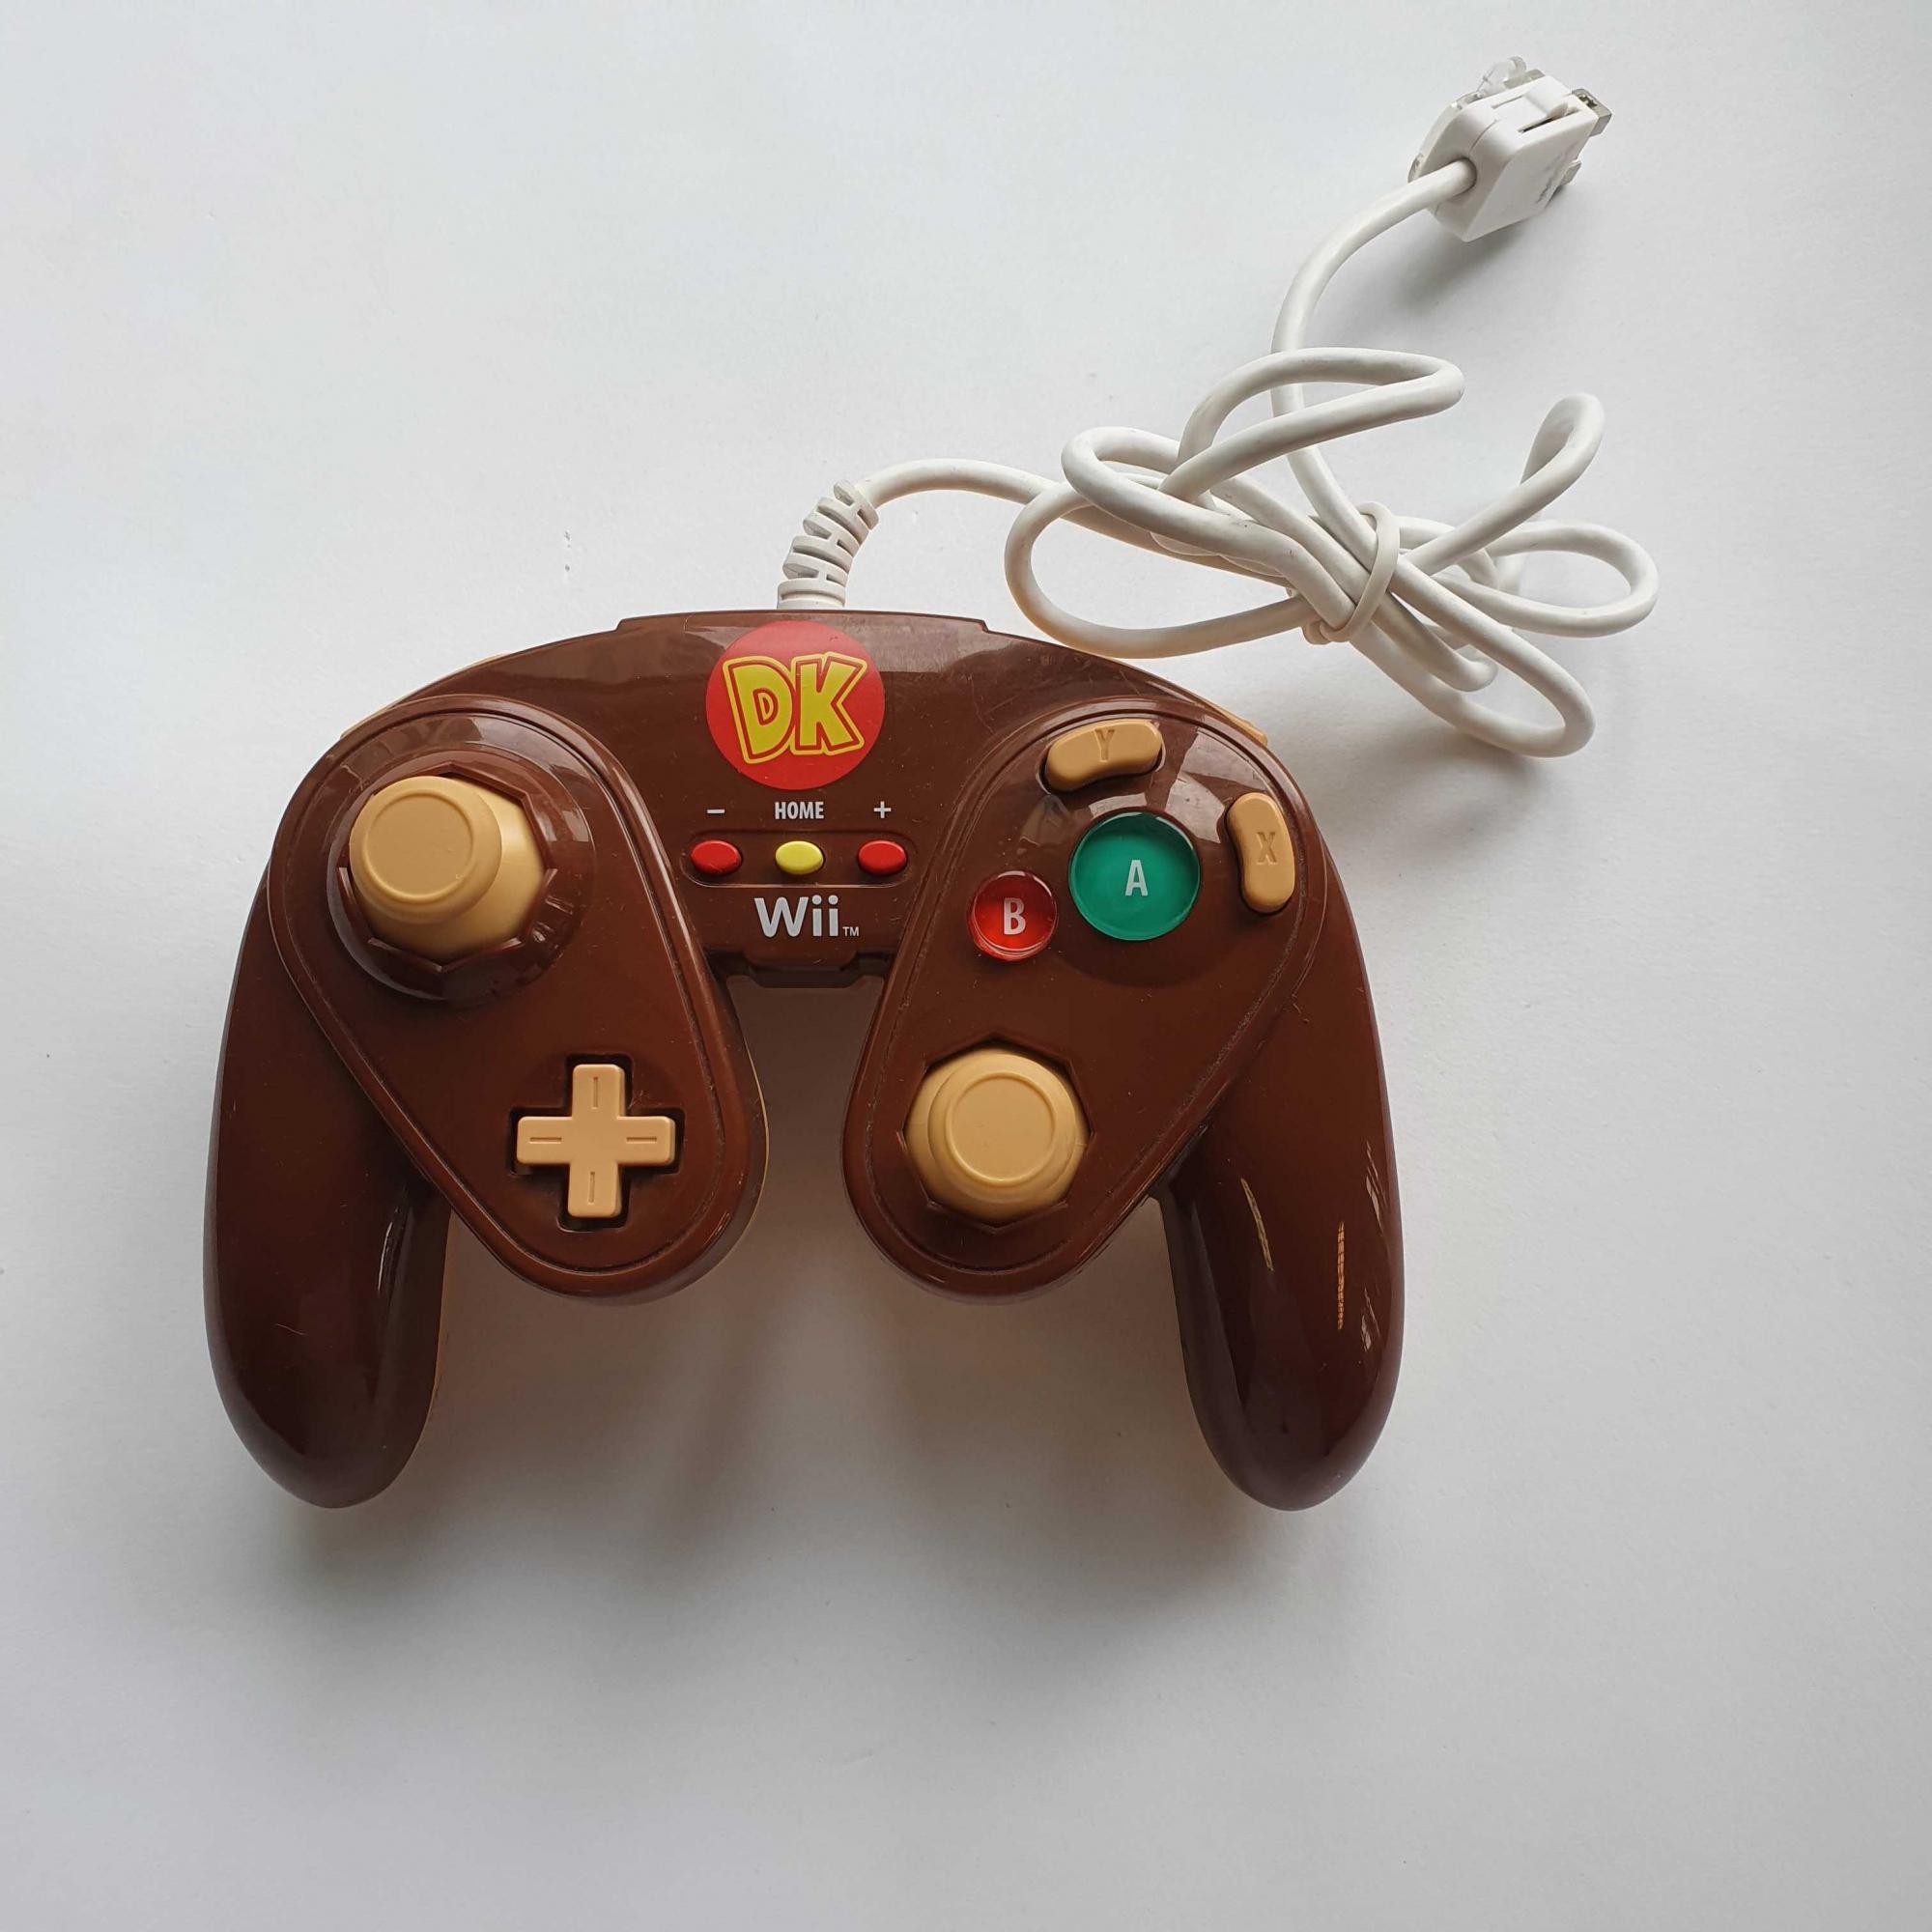 Controle GameCube (Donkey Kong) para Nintendo WIi - Nintendo Wii - Usado